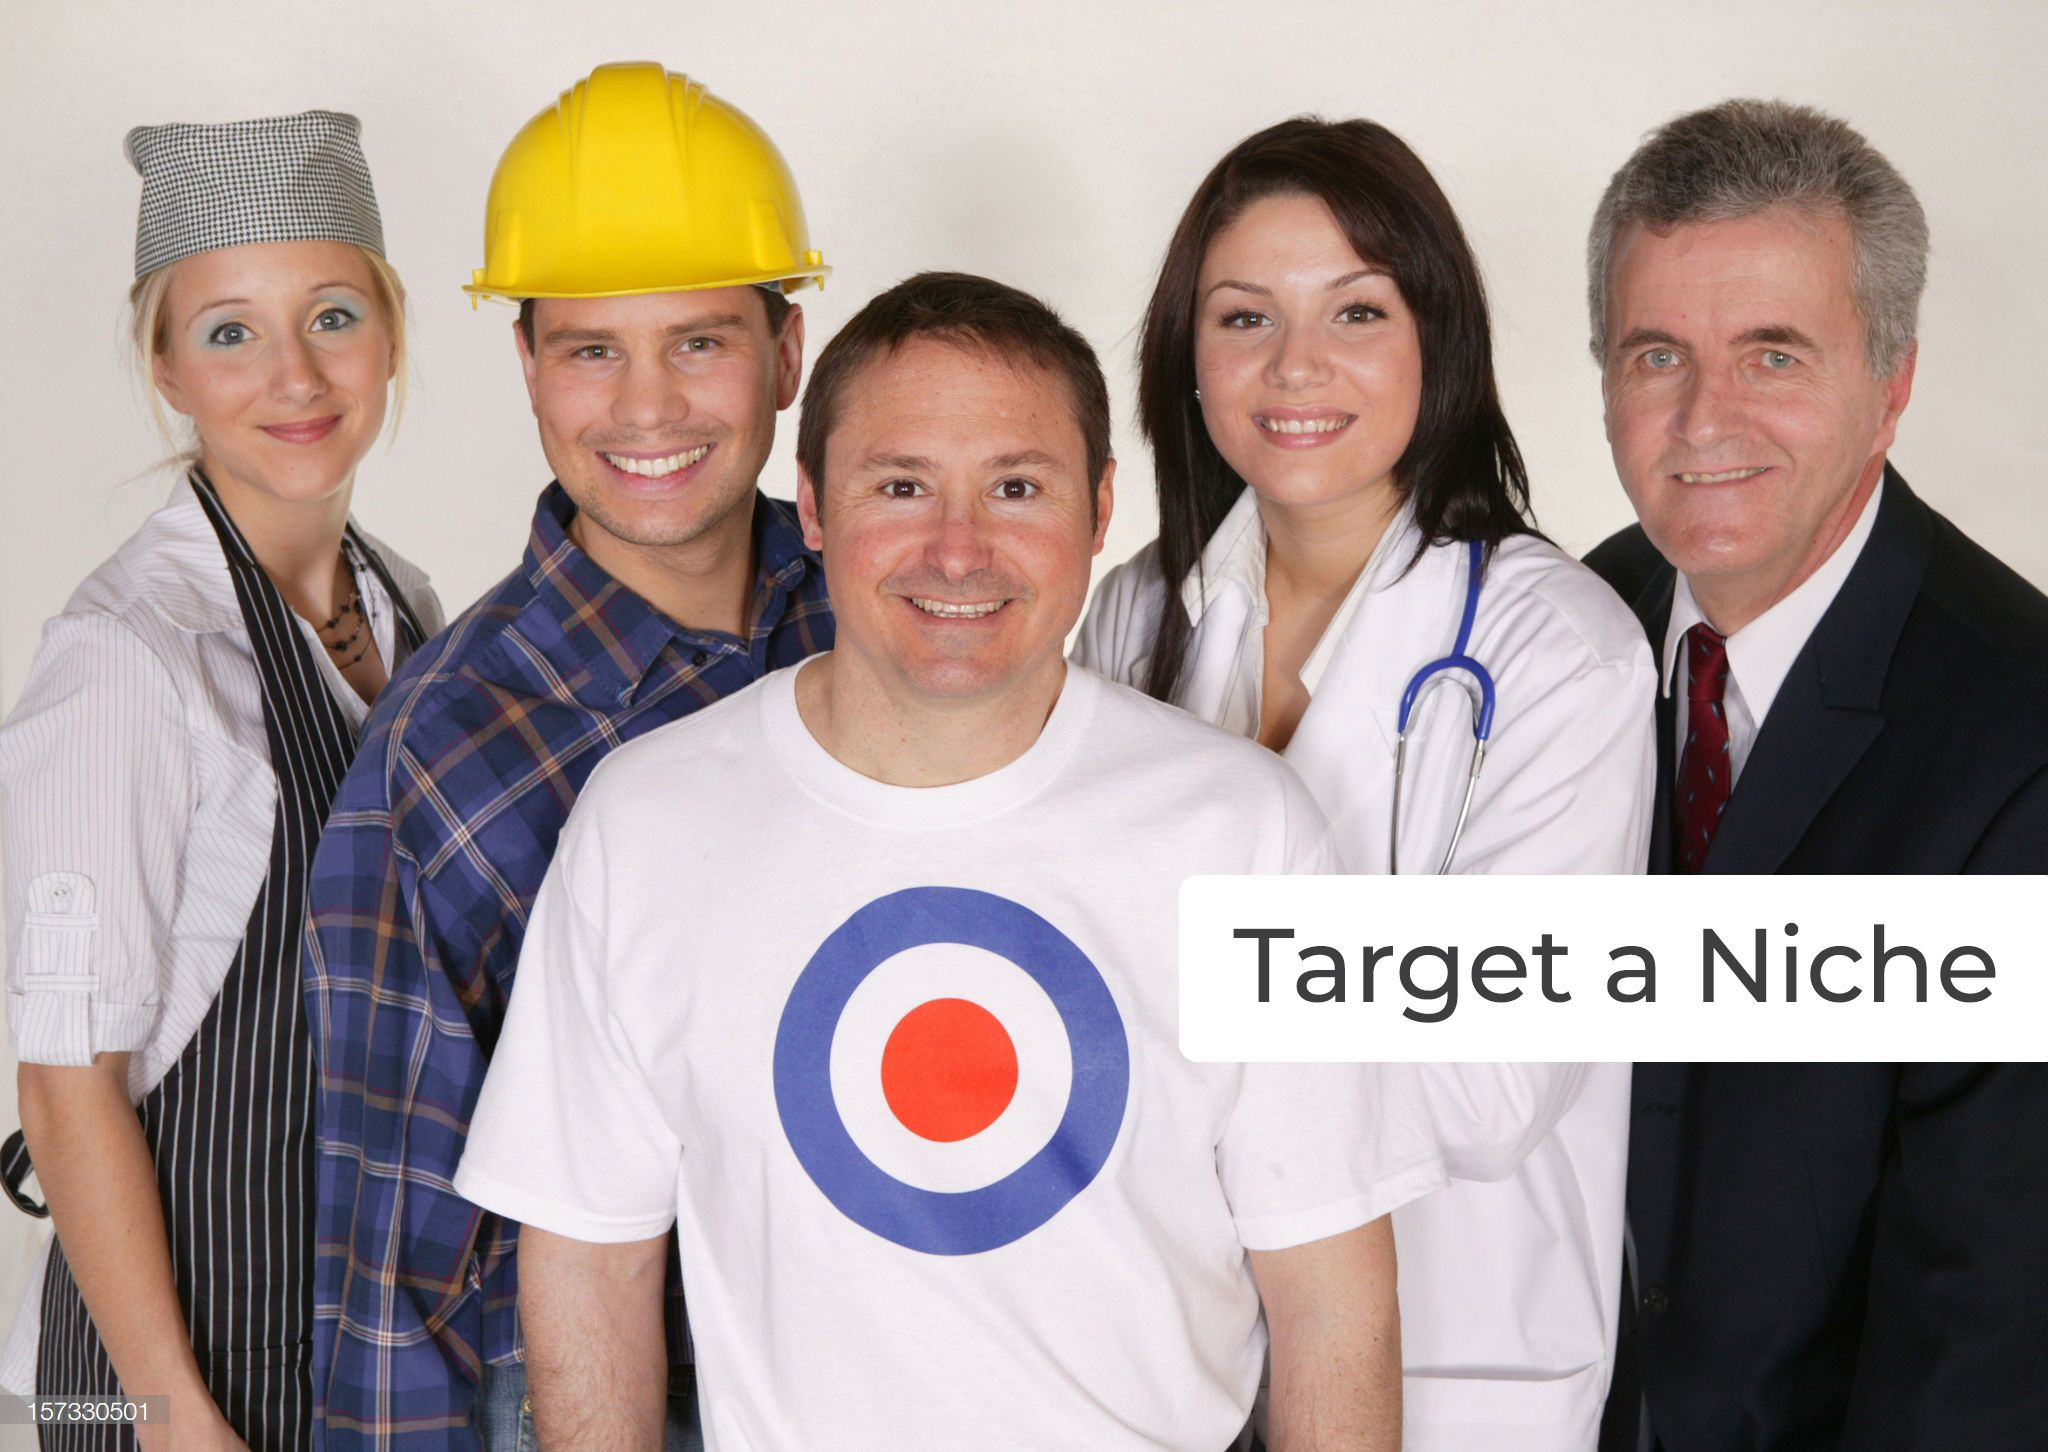 target a niche